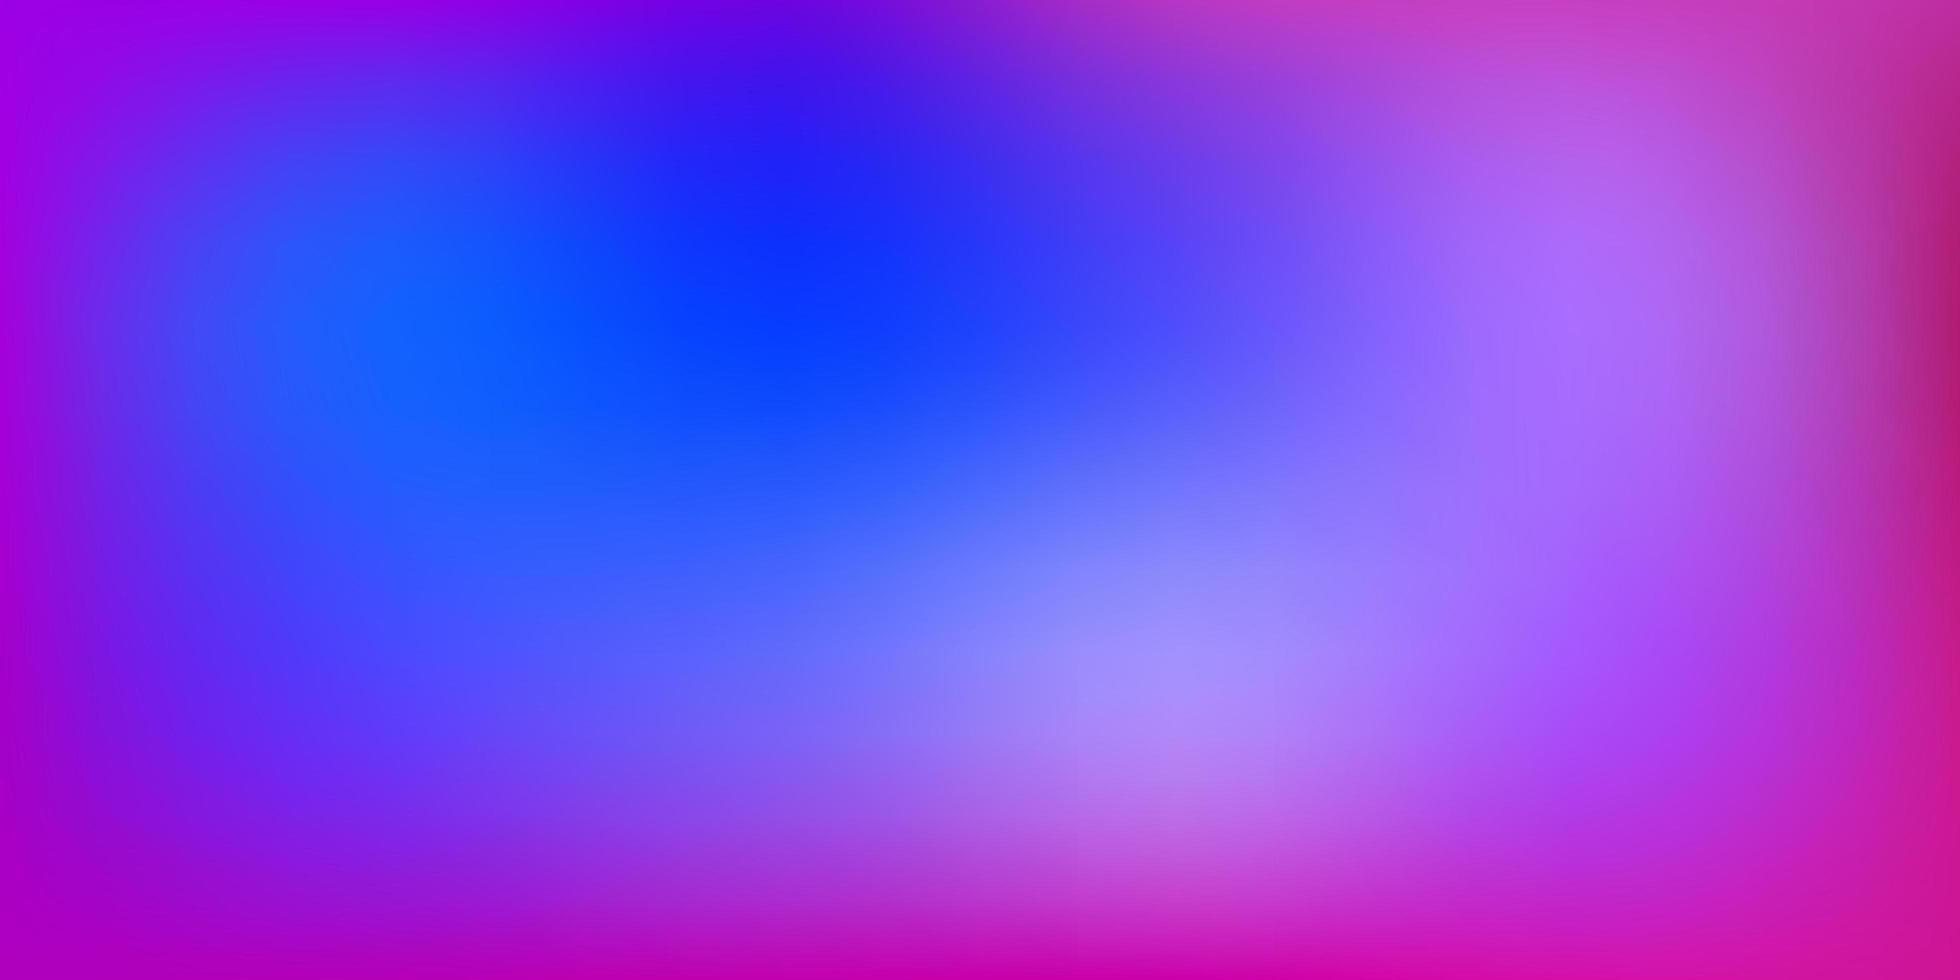 Light Blue, Red vector gradient blur pattern.